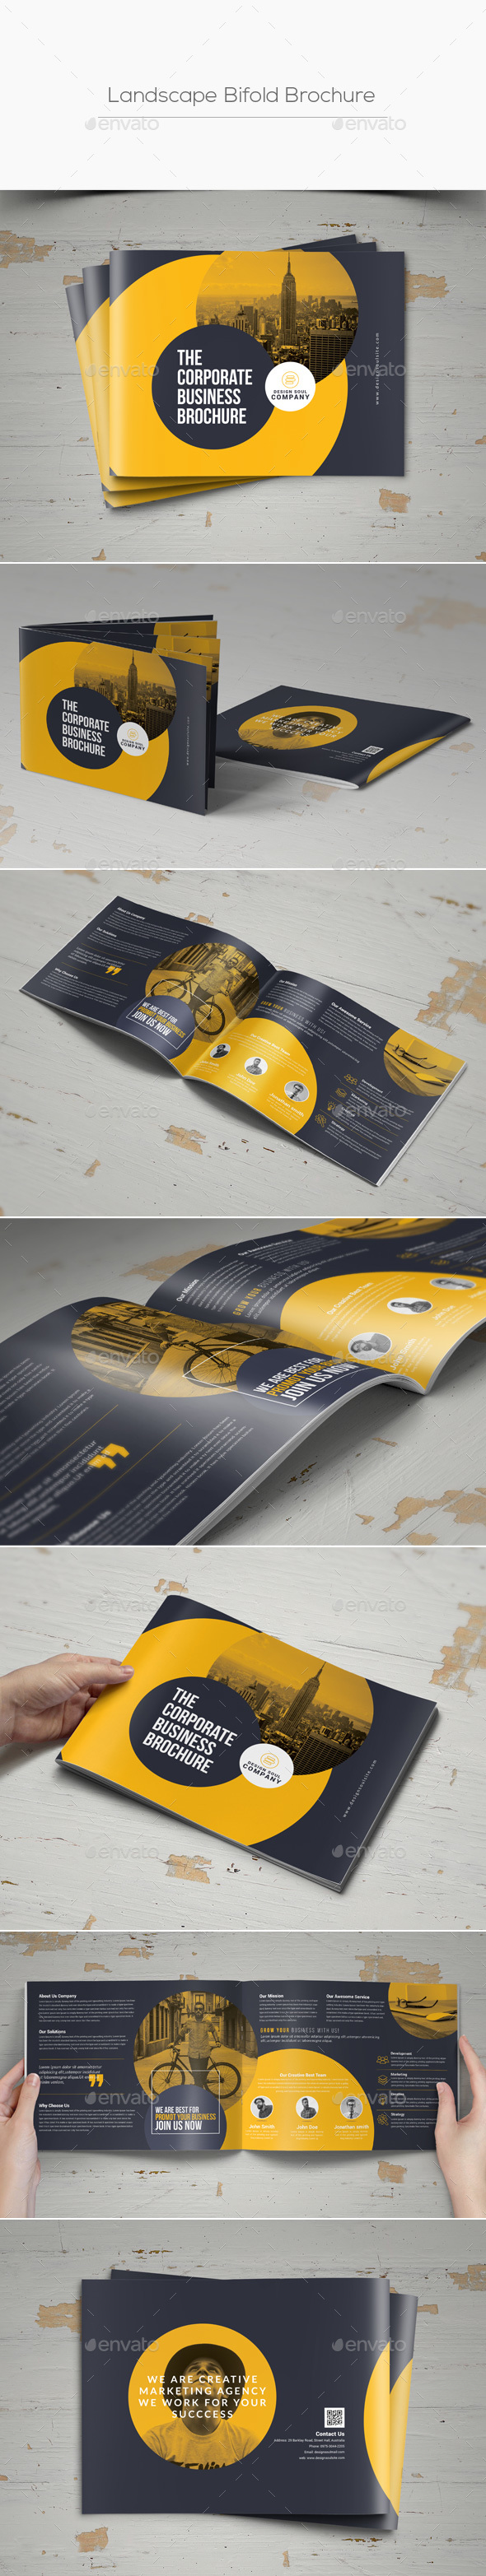 GraphicRiver Landscape Bifold Brochure 20375821